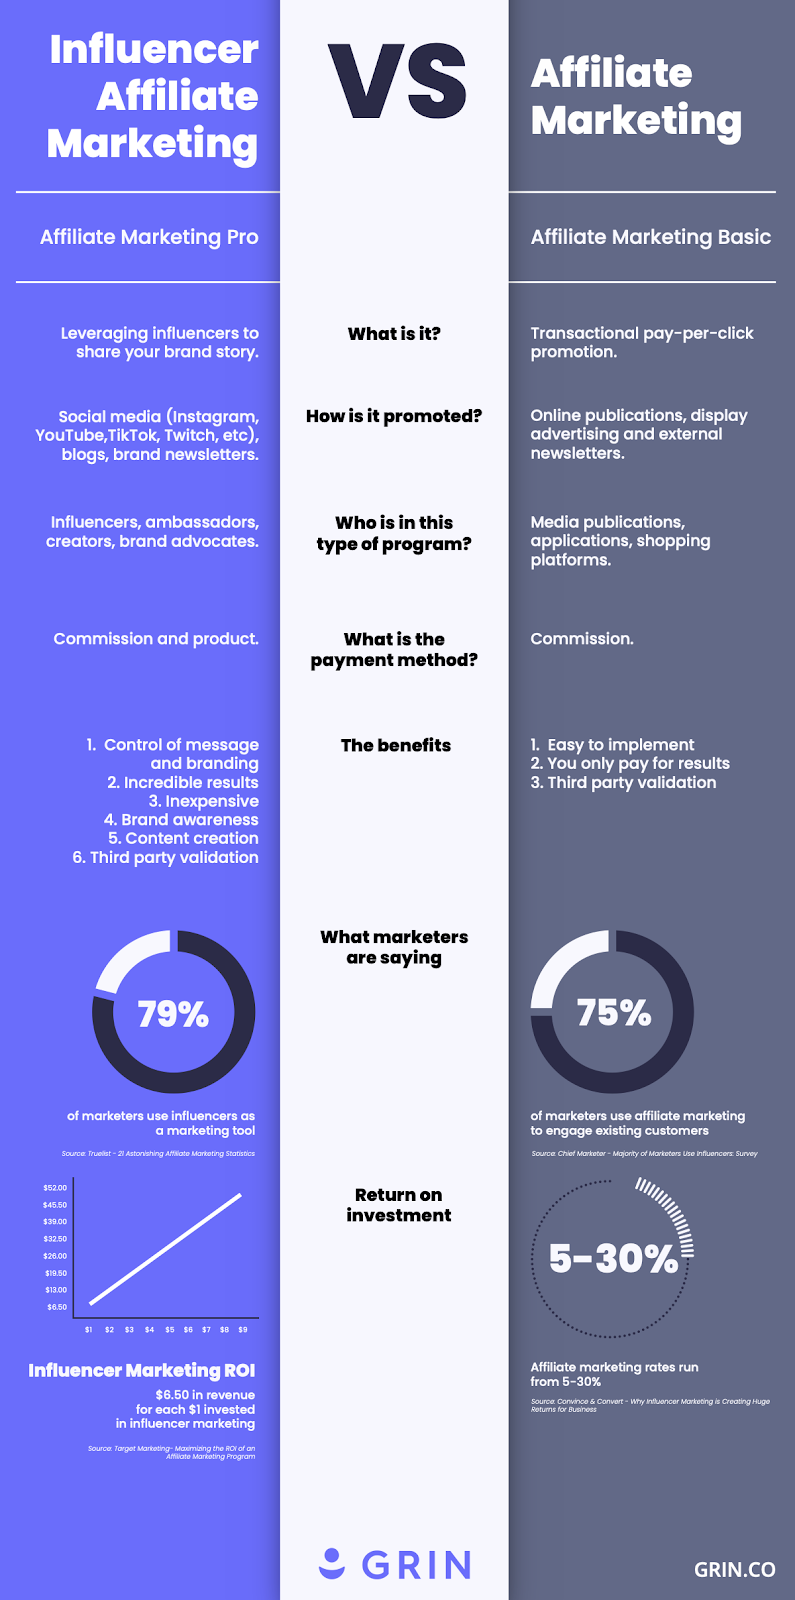 influencer marketing vs affiliate marketing grin influencer marketing